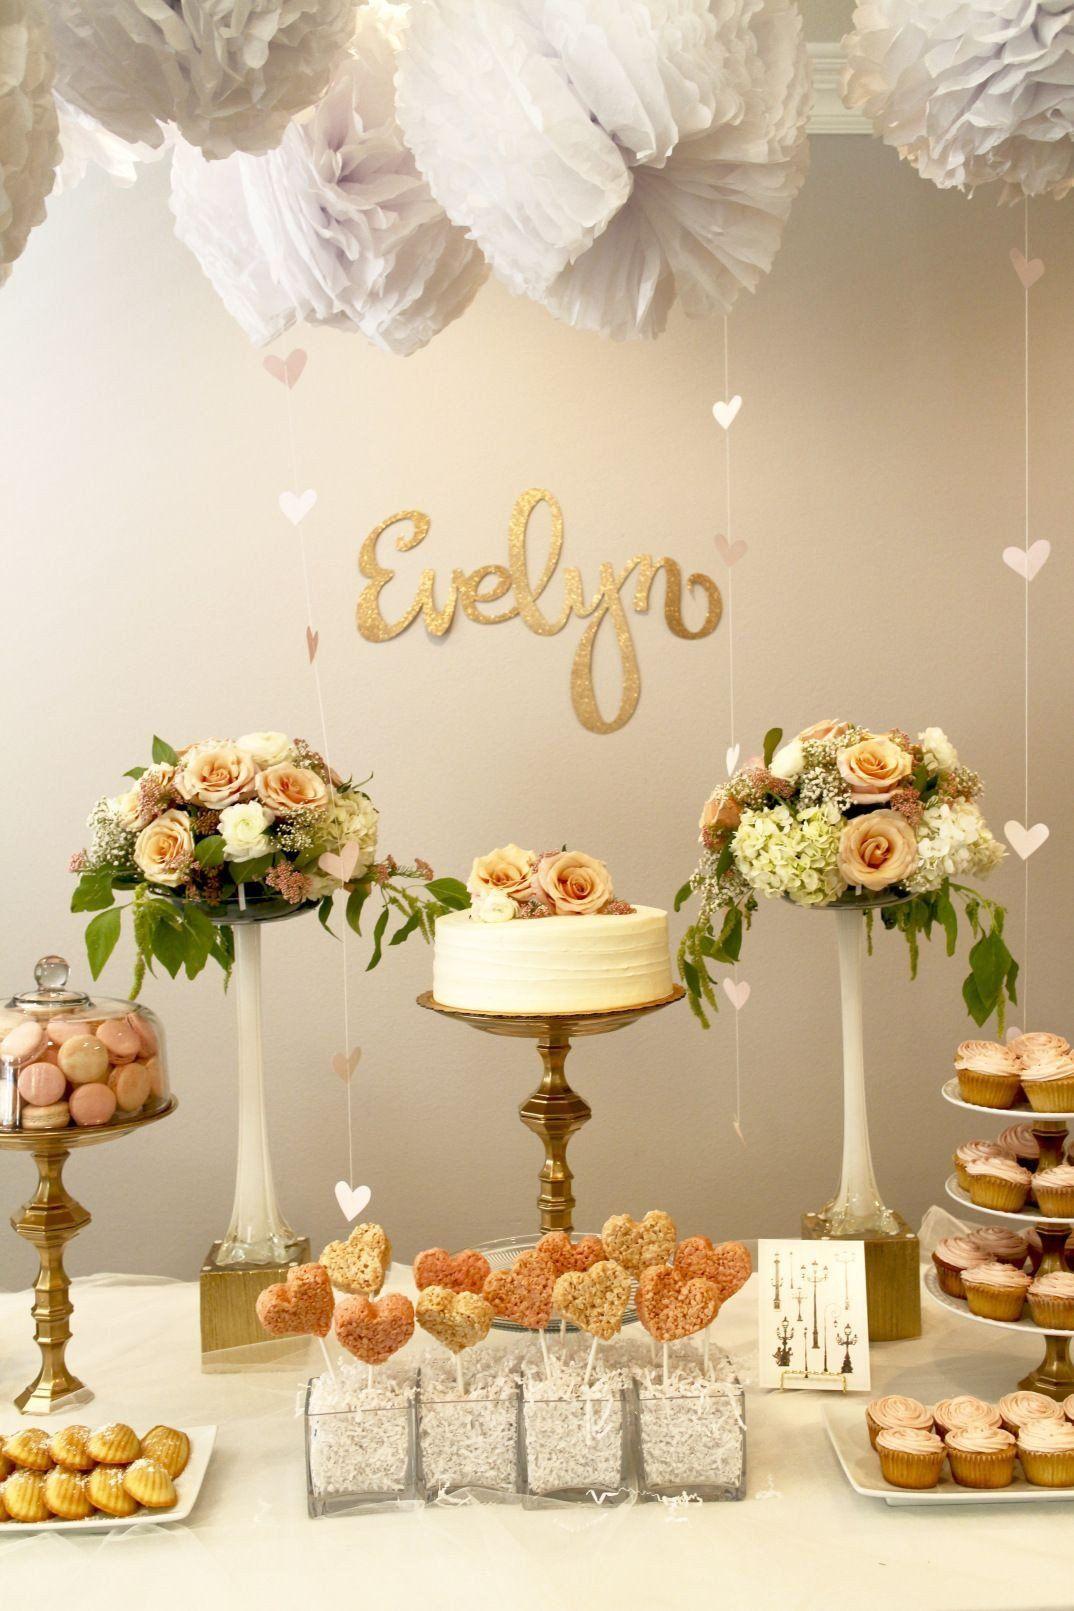 70th birthday party decoration ideas luxury bon